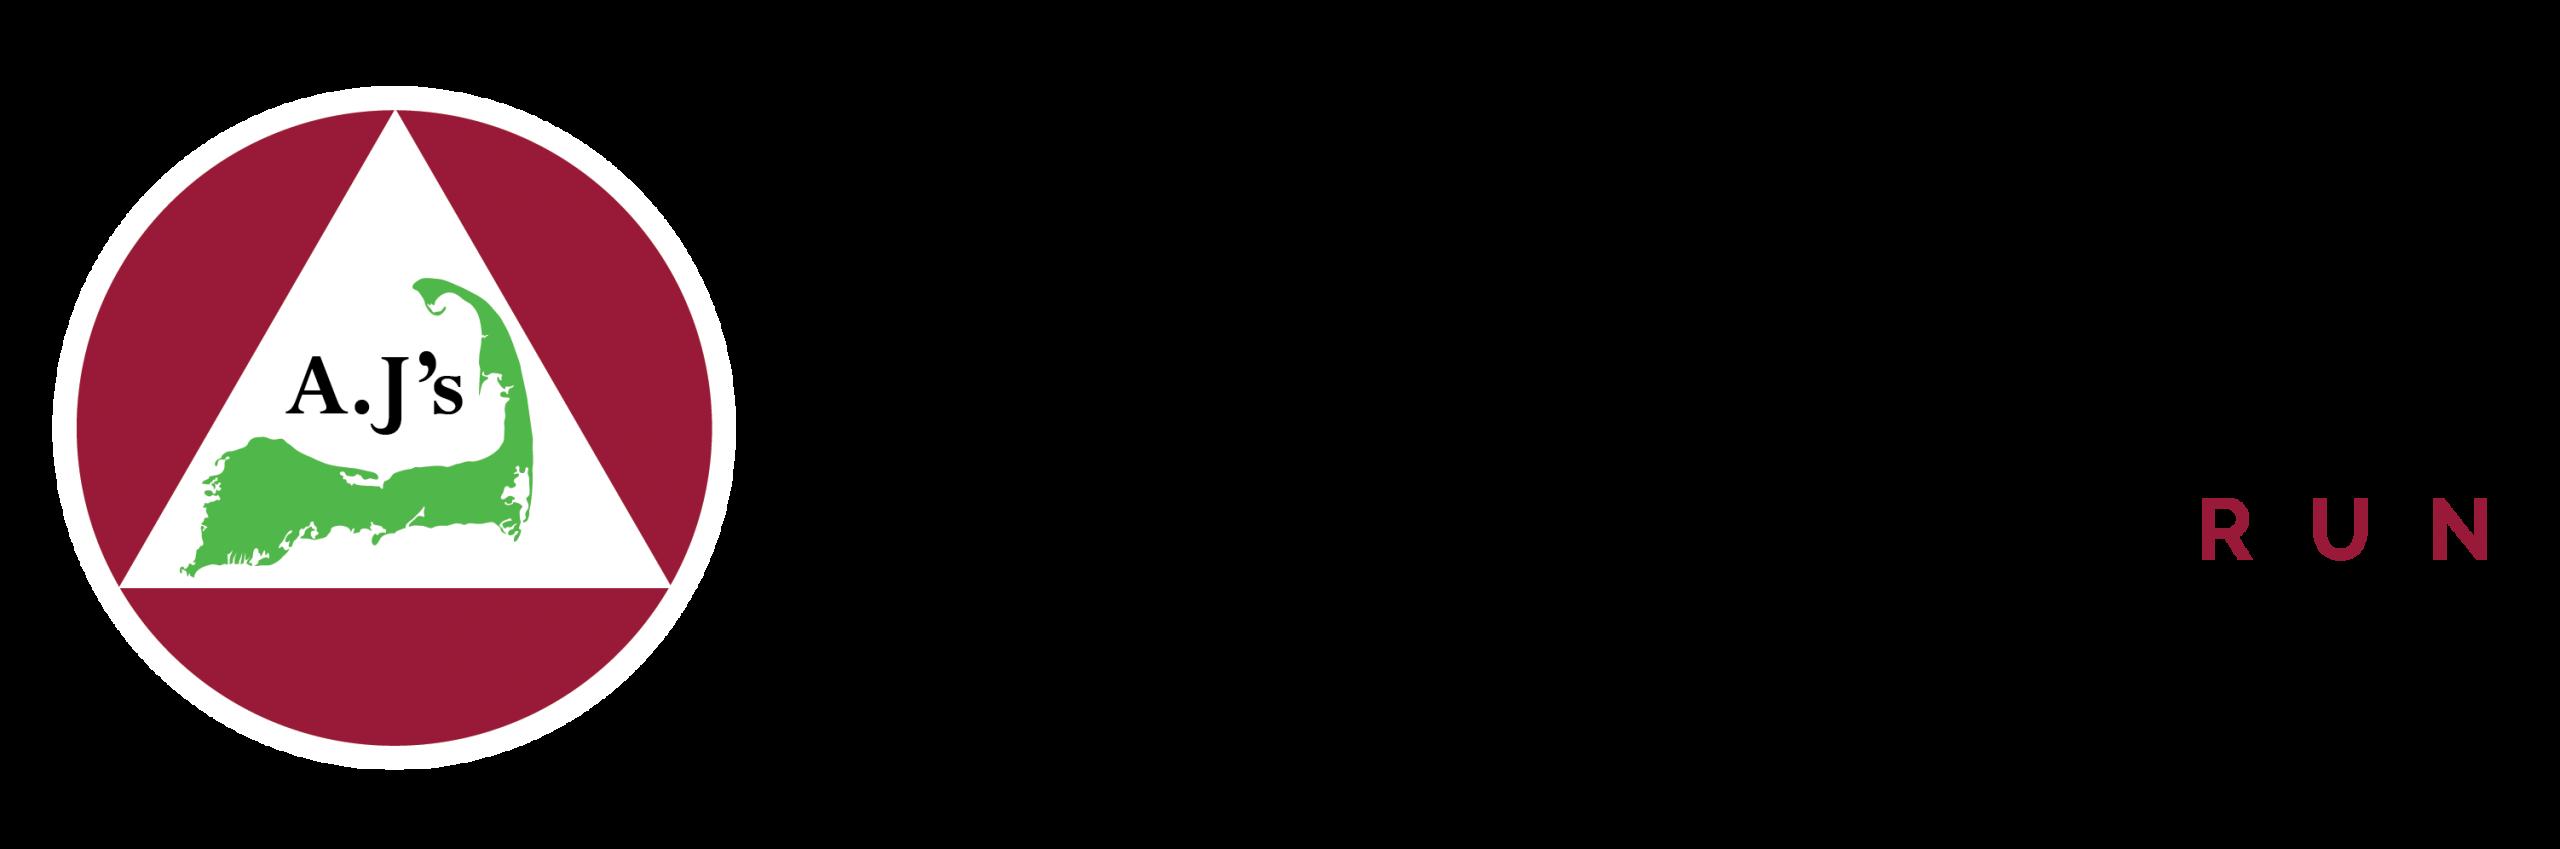 AjsLogo-01